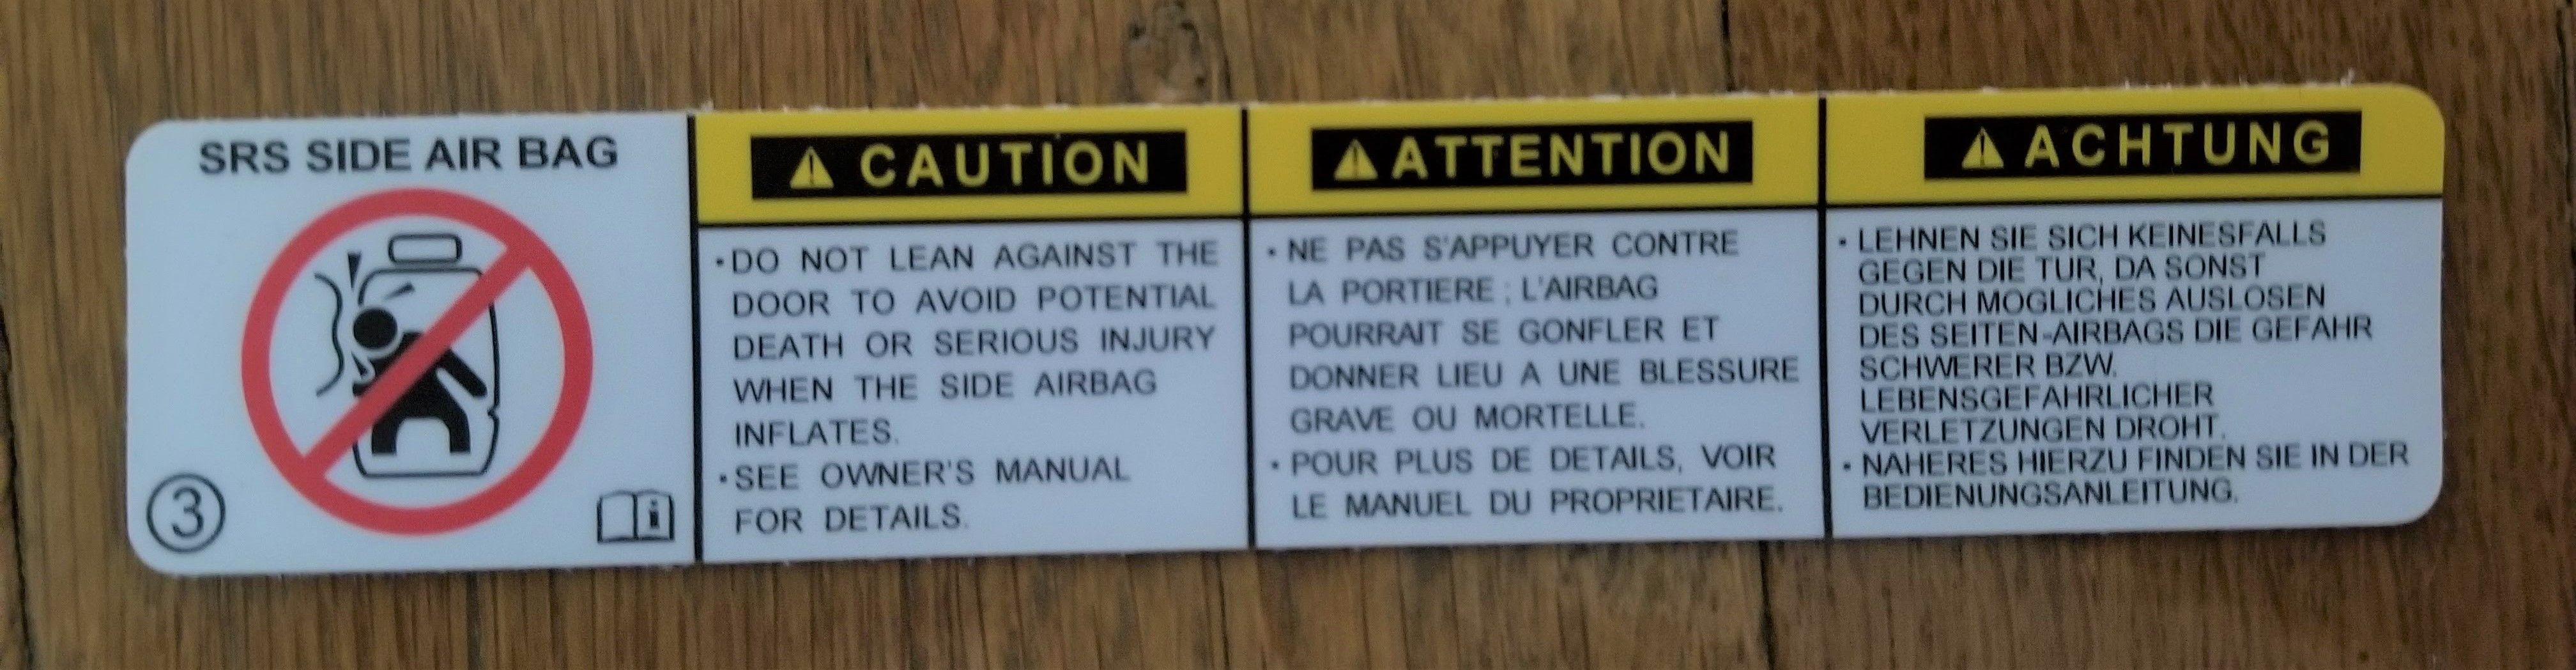 Airbag Label English French Labels Serious Injury Air Bag [ 1048 x 4032 Pixel ]